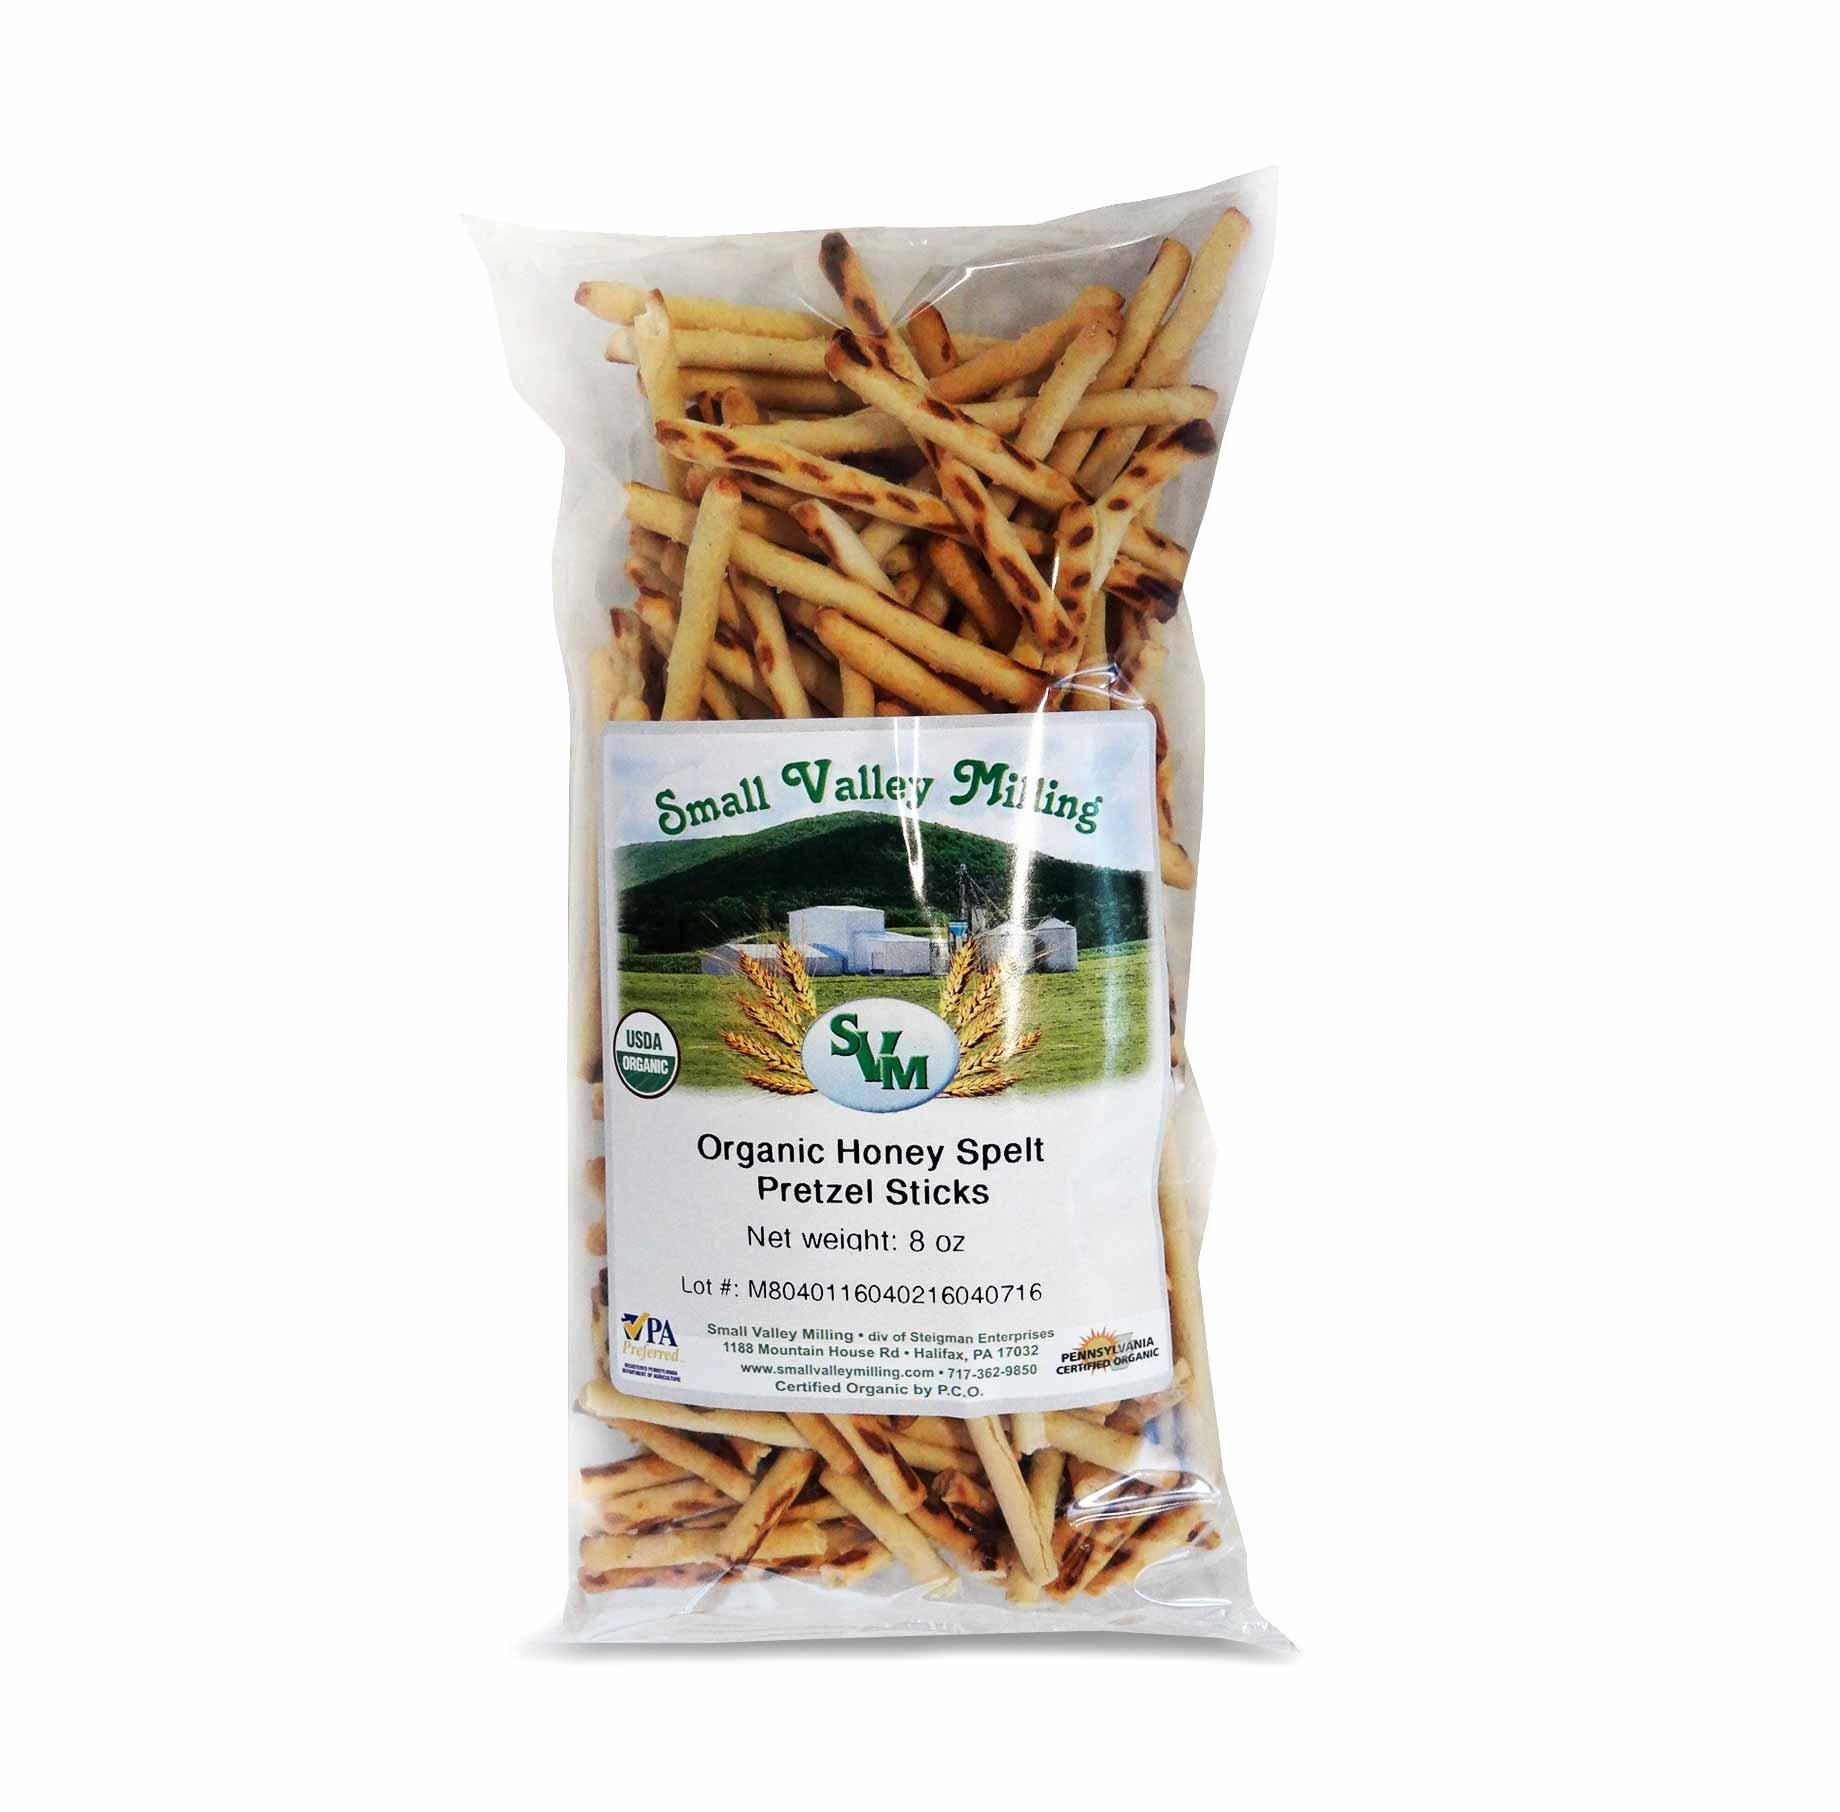 Organic Honey Spelt Pretzel Sticks